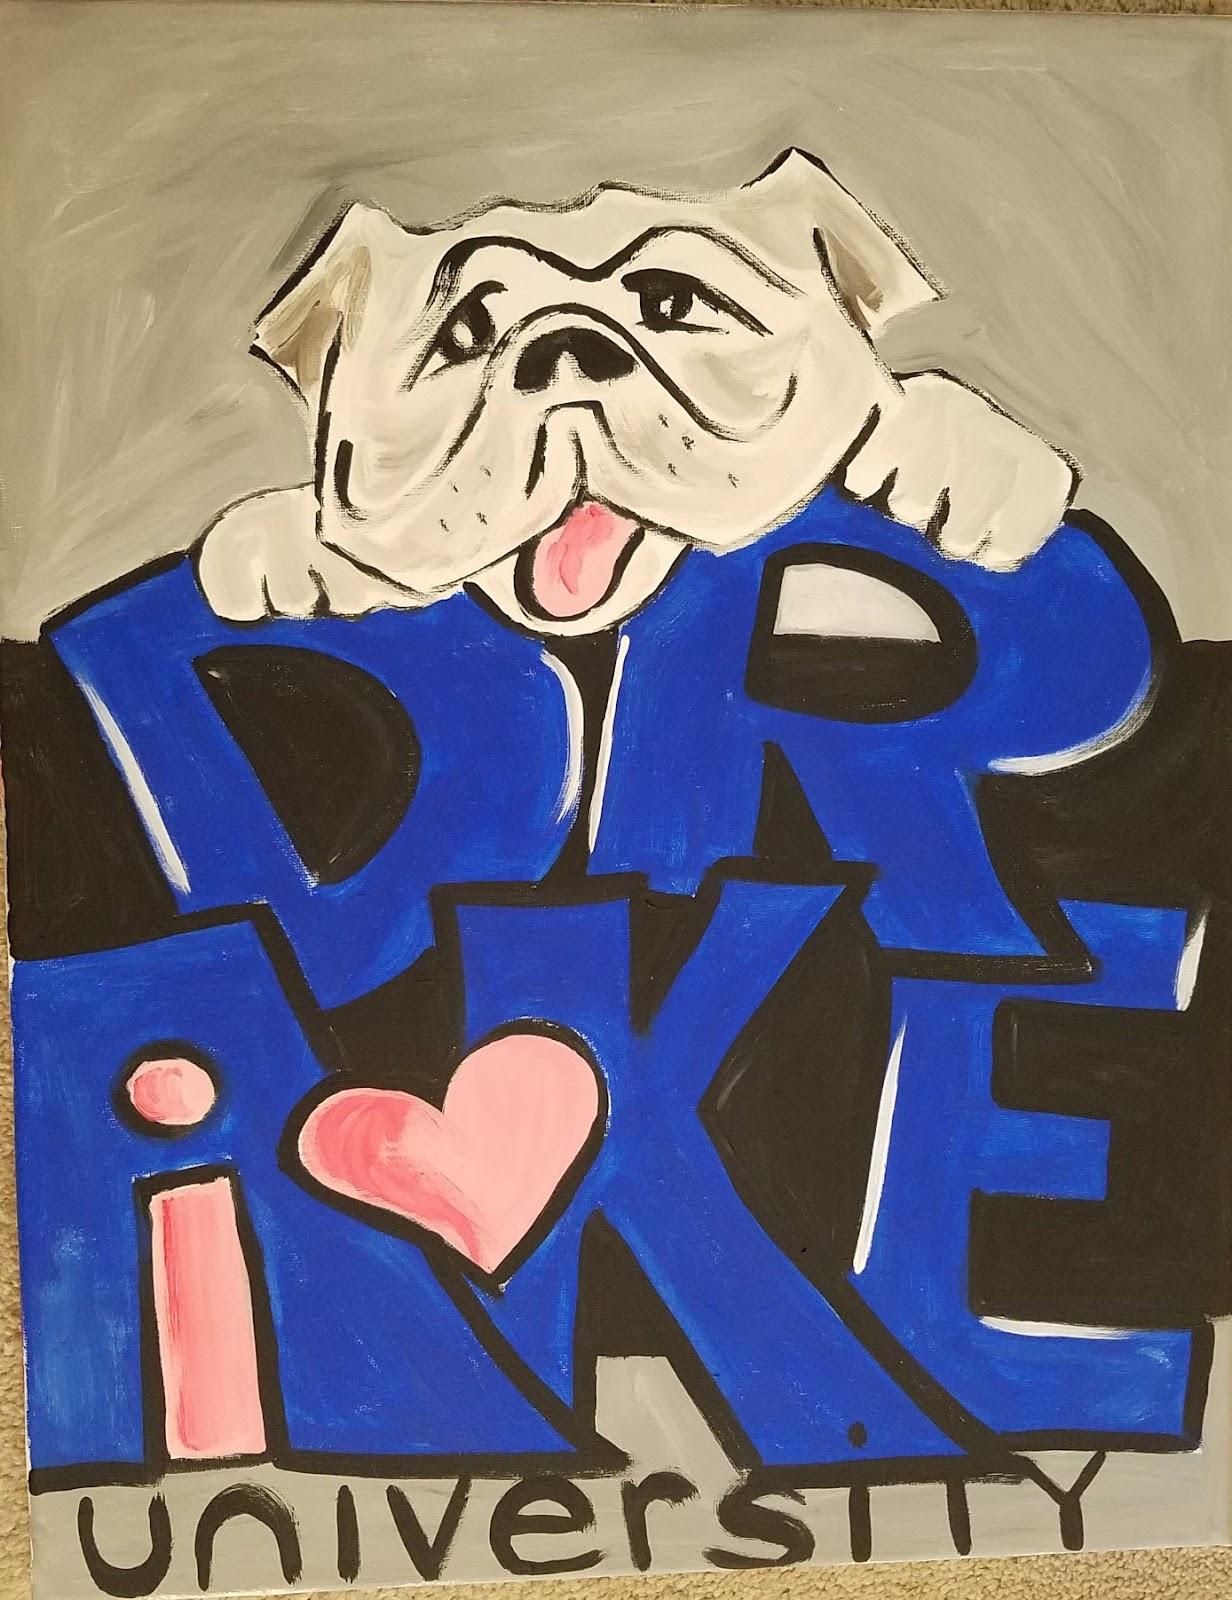 Griff the Bulldog mascot